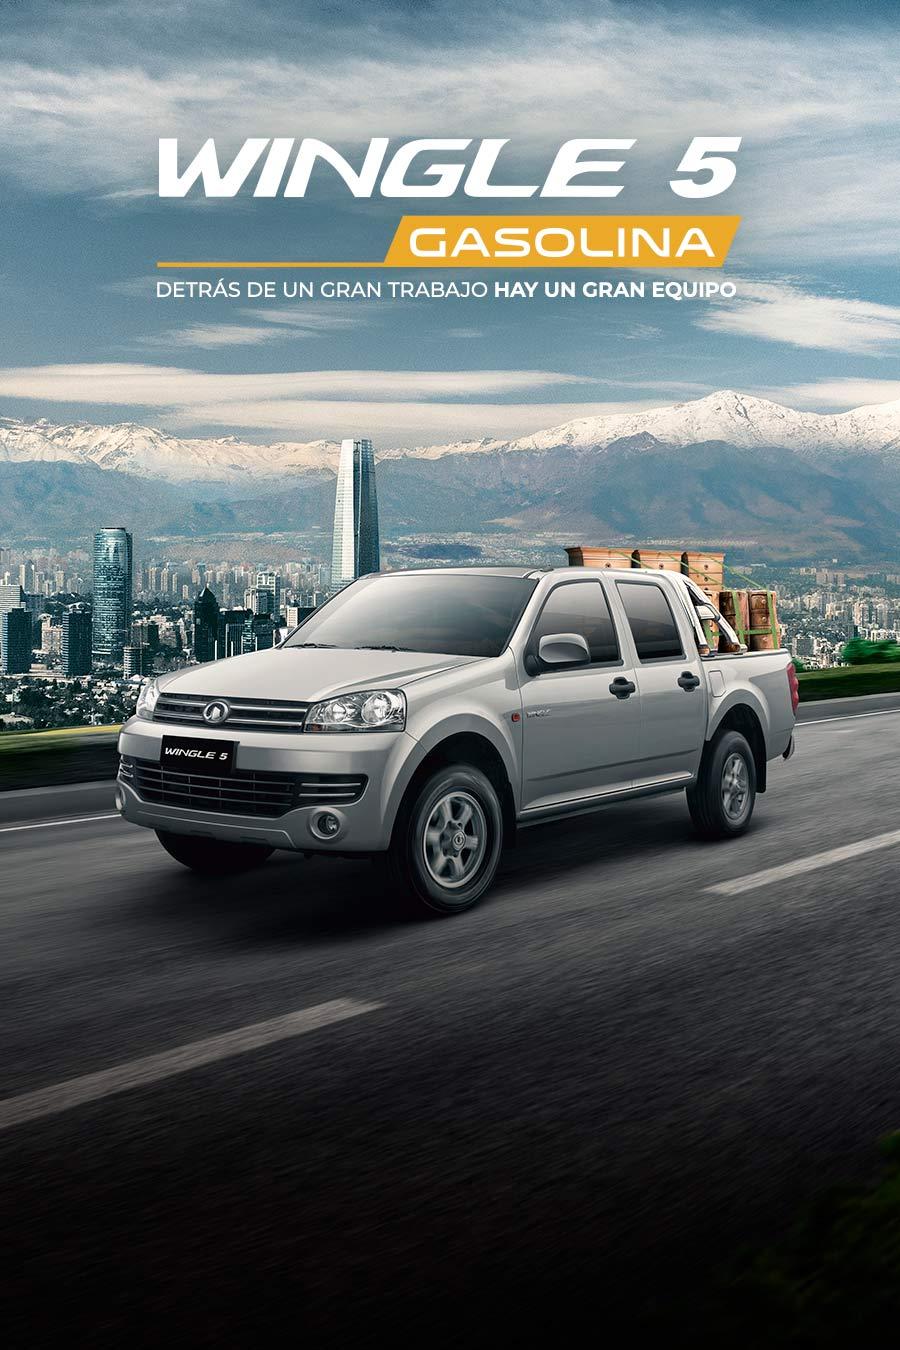 Wingle 5 Gasolina Doble Cabina